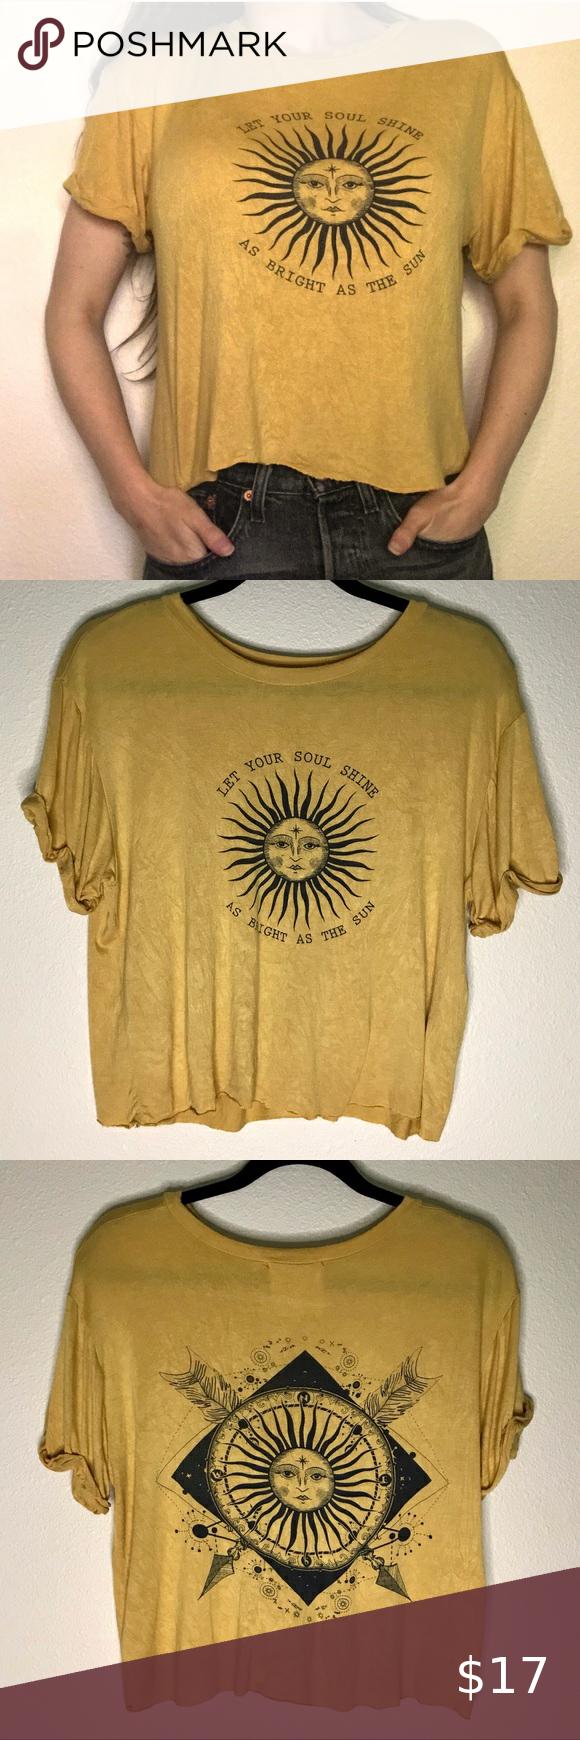 Celestial Sun Crop Top Shirt Mustard Graphic Tee In 2020 Crop Top Shirts Crop Tops Vintage Shirts